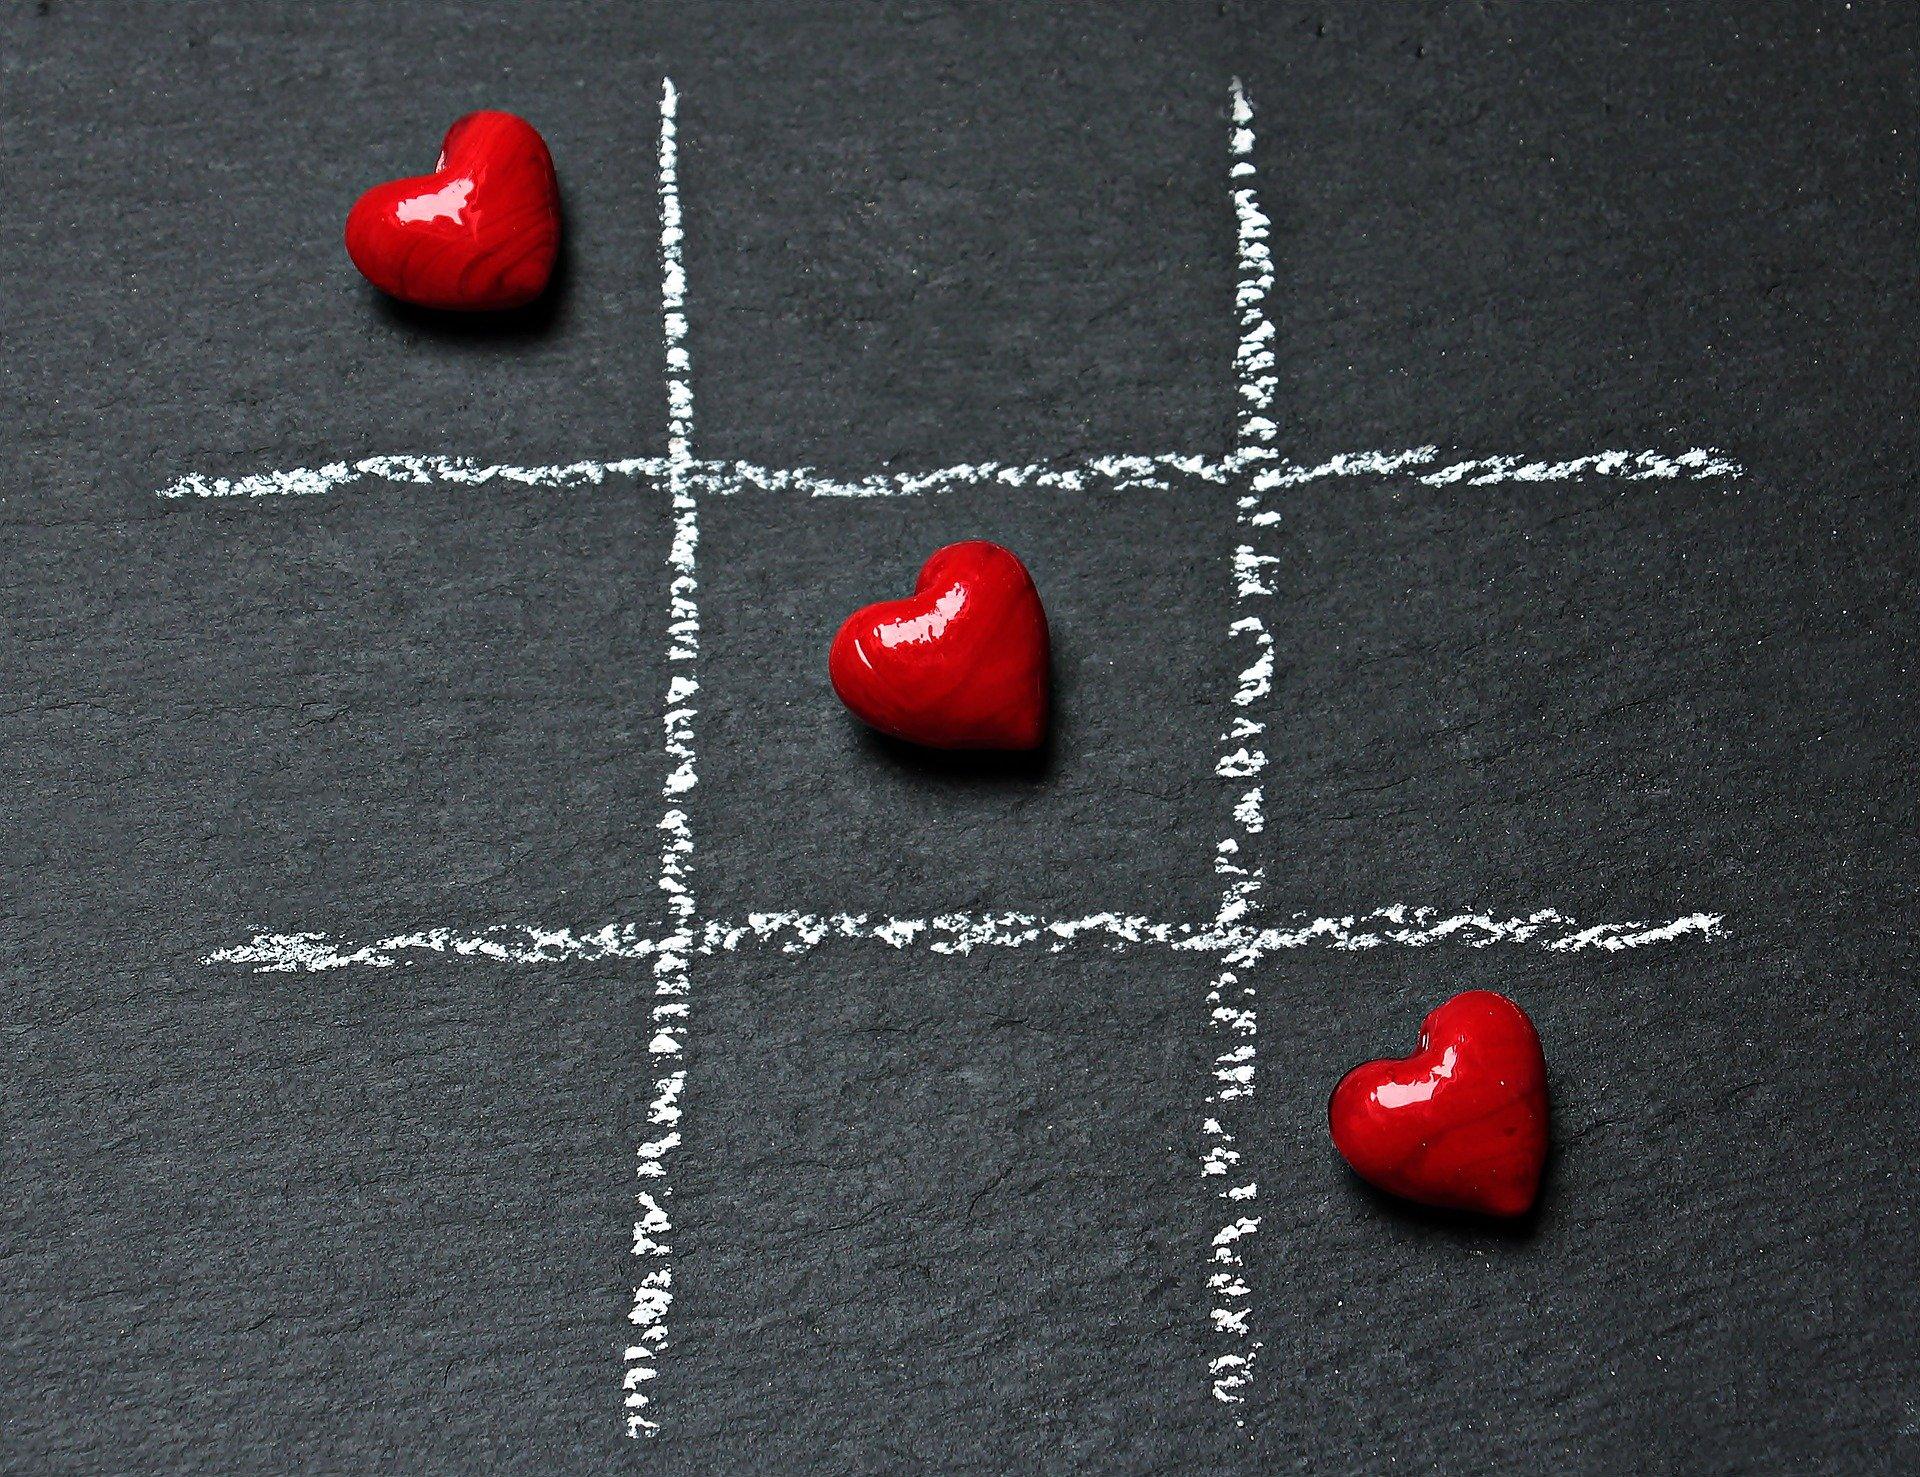 Chalk tic tac toe board with three diagonal hearts